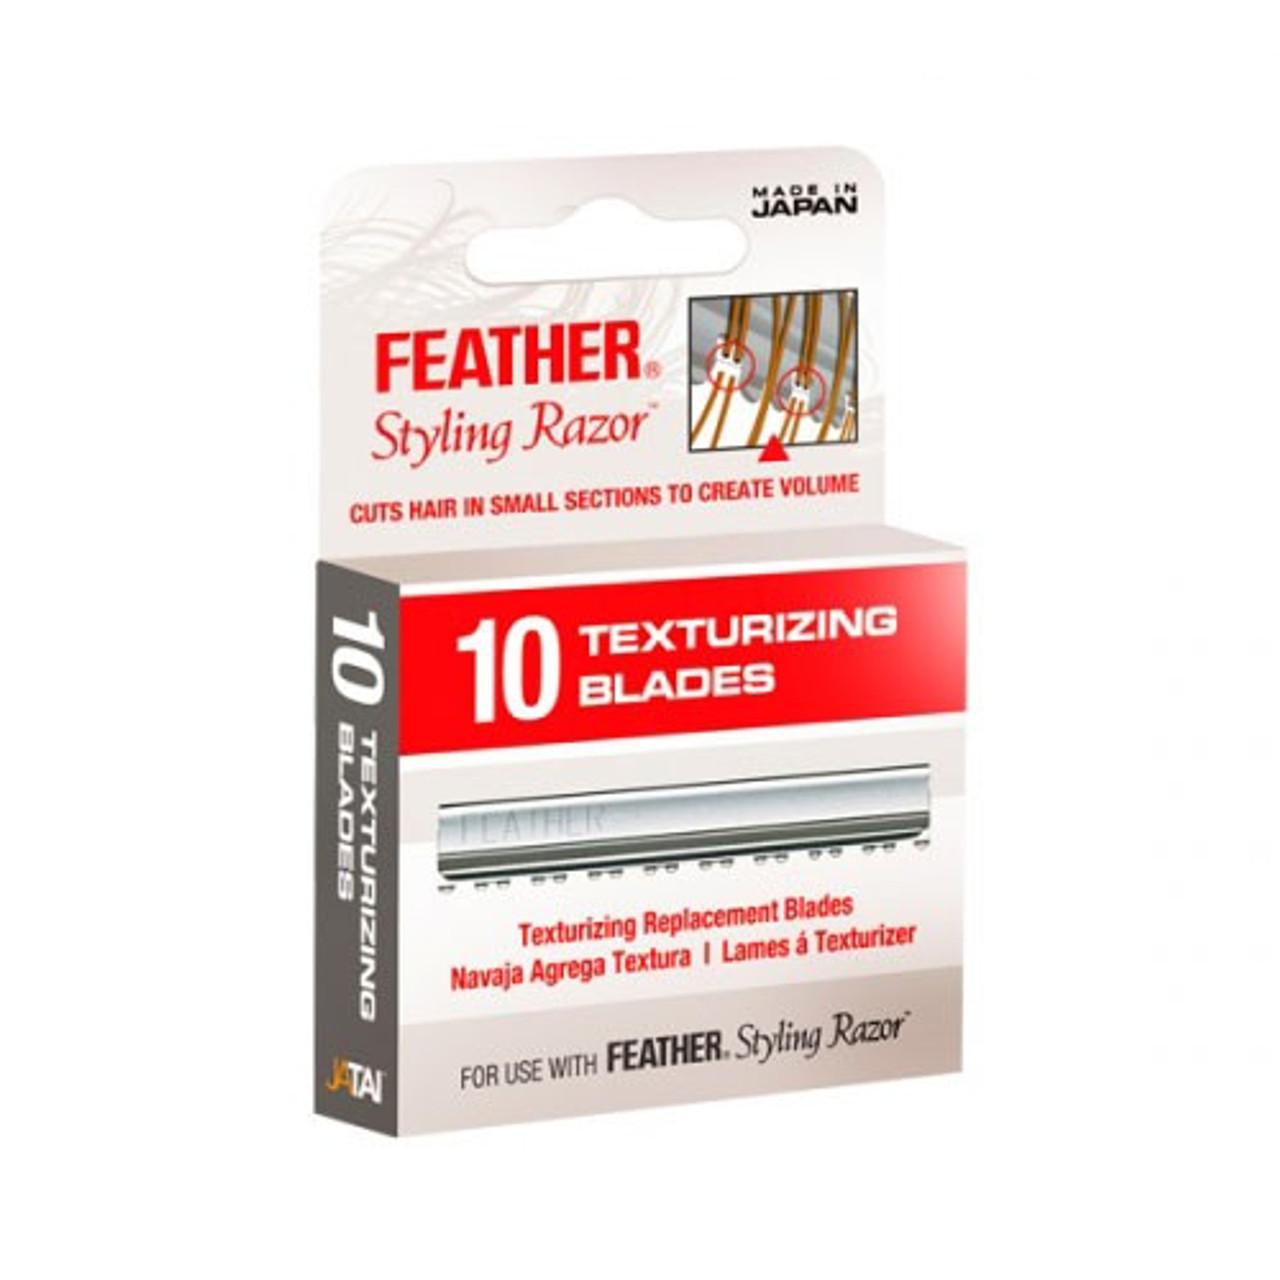 Feather Texturizing Blades